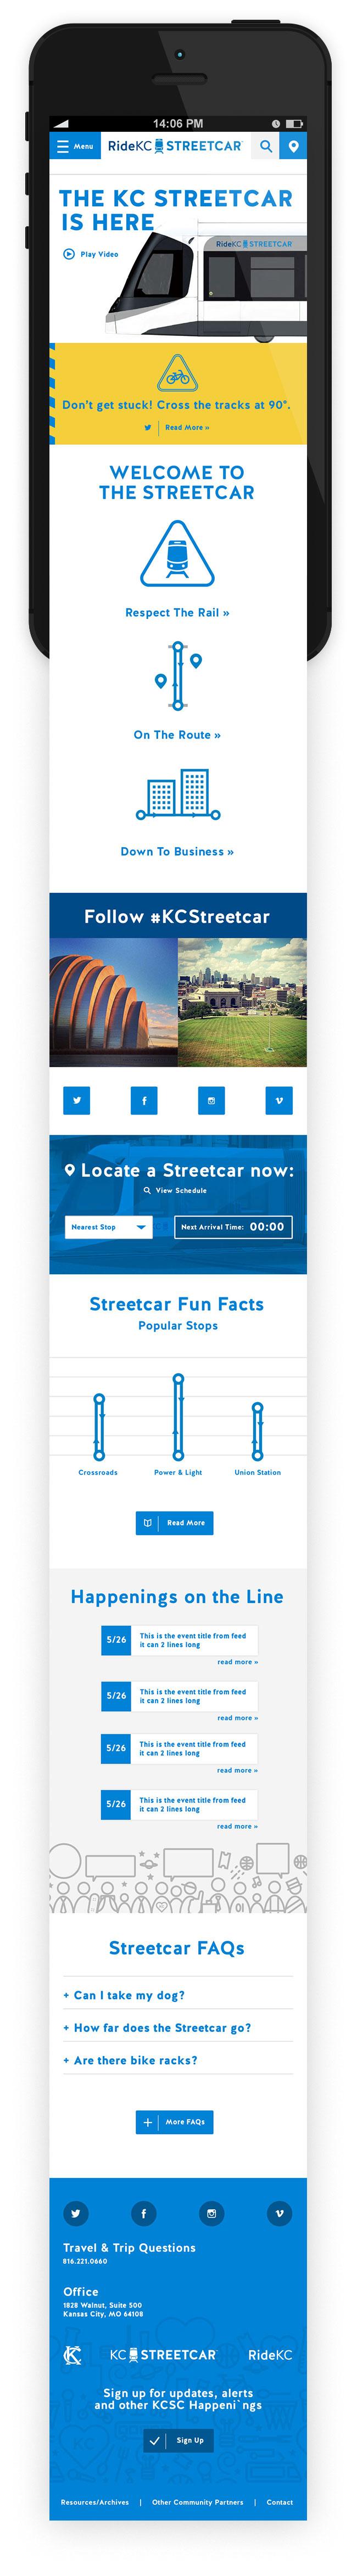 KCstreetcar_Home_Mobil_28SEP15.jpg